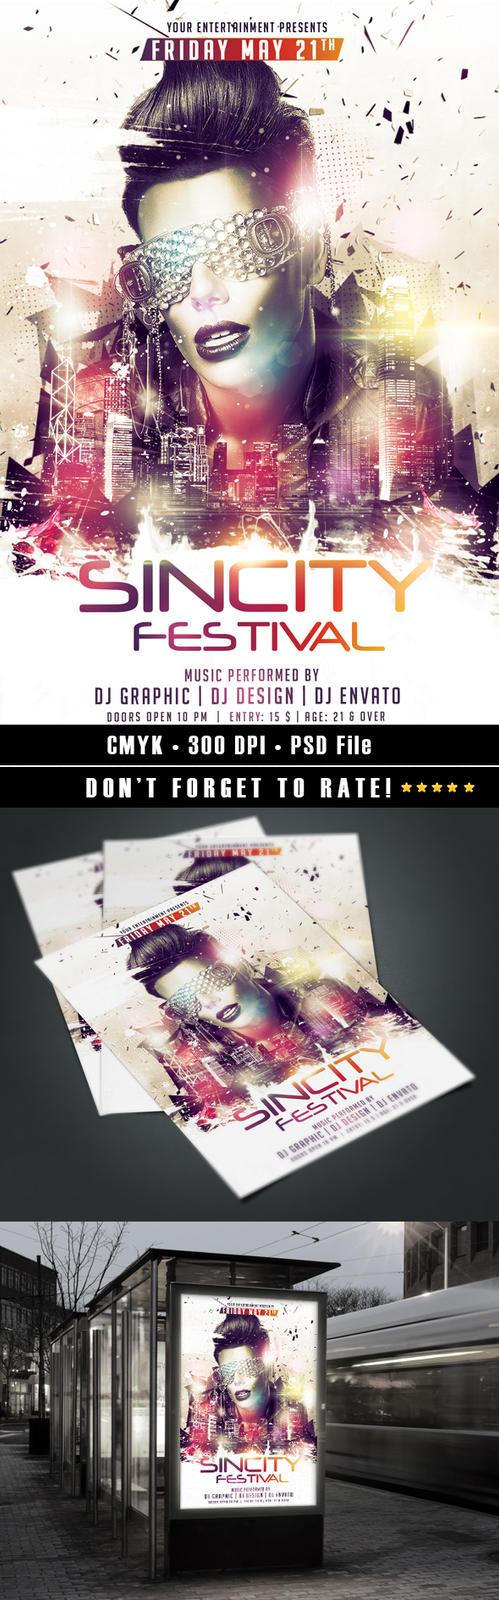 Sincity Festival by HDesign85